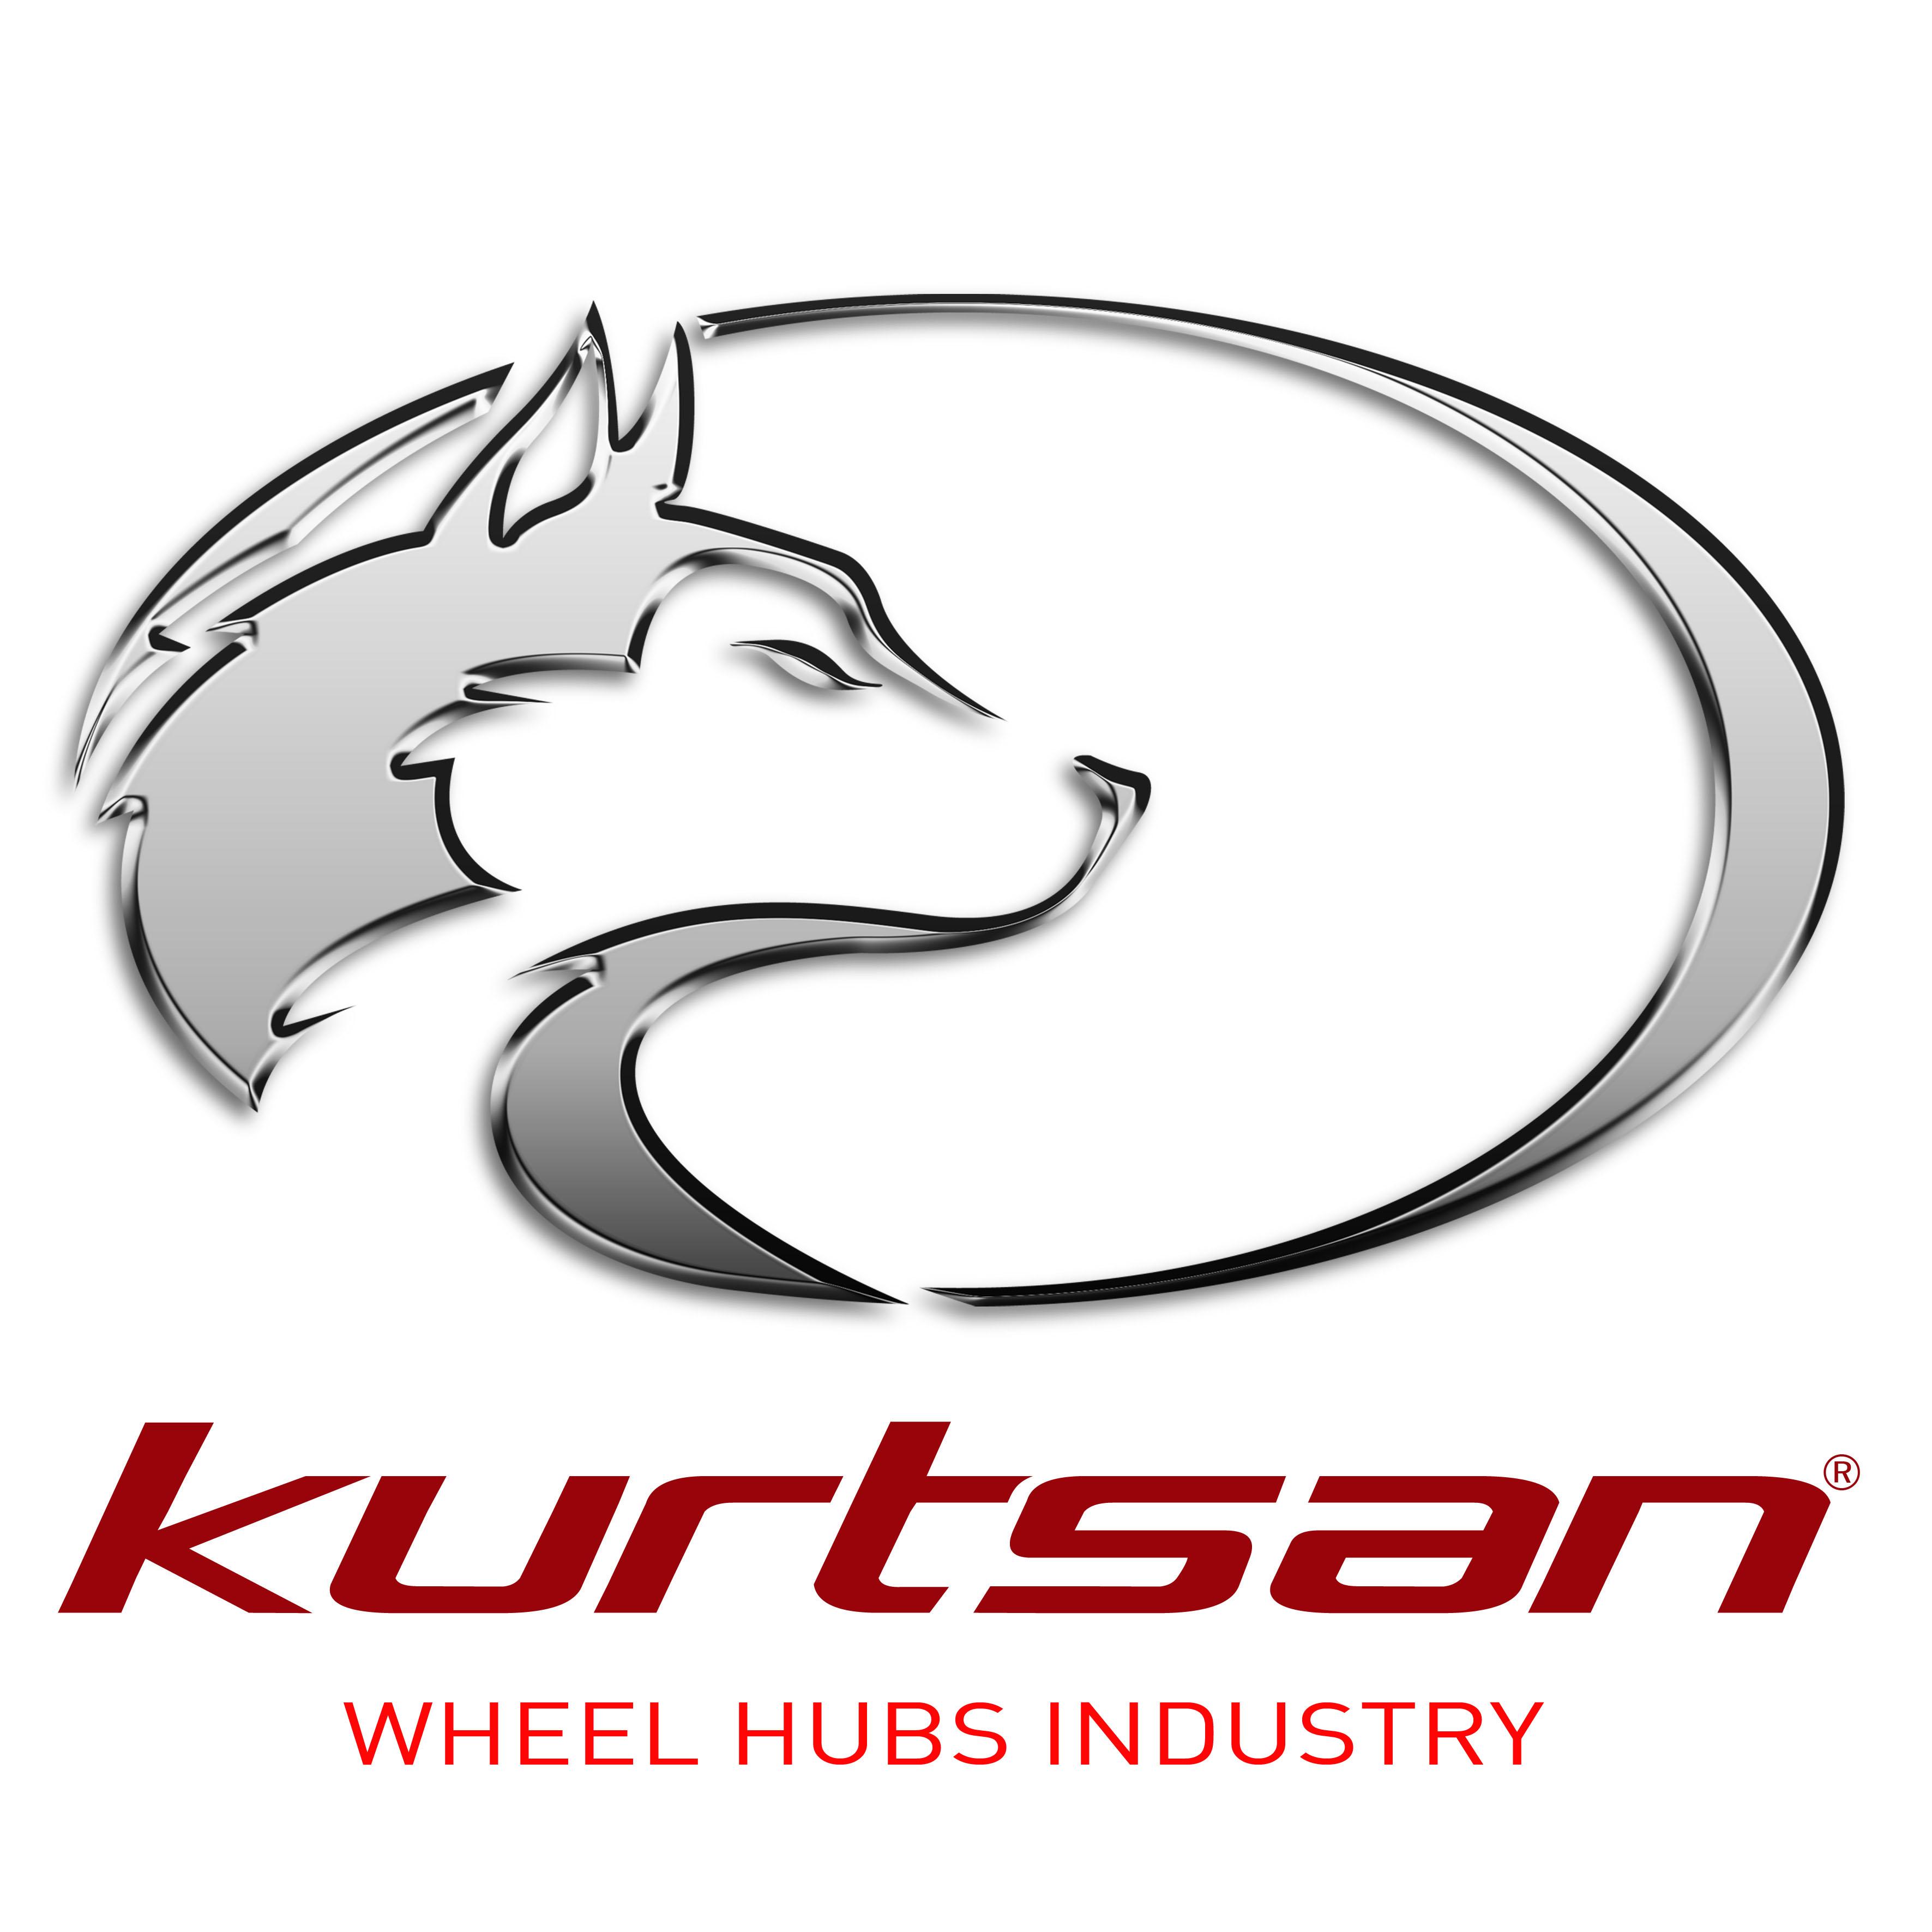 Kurtsan Otomotiv Sanayi ve Ticaret Ltd.Şti., KURTSAN WHEEL HUBS